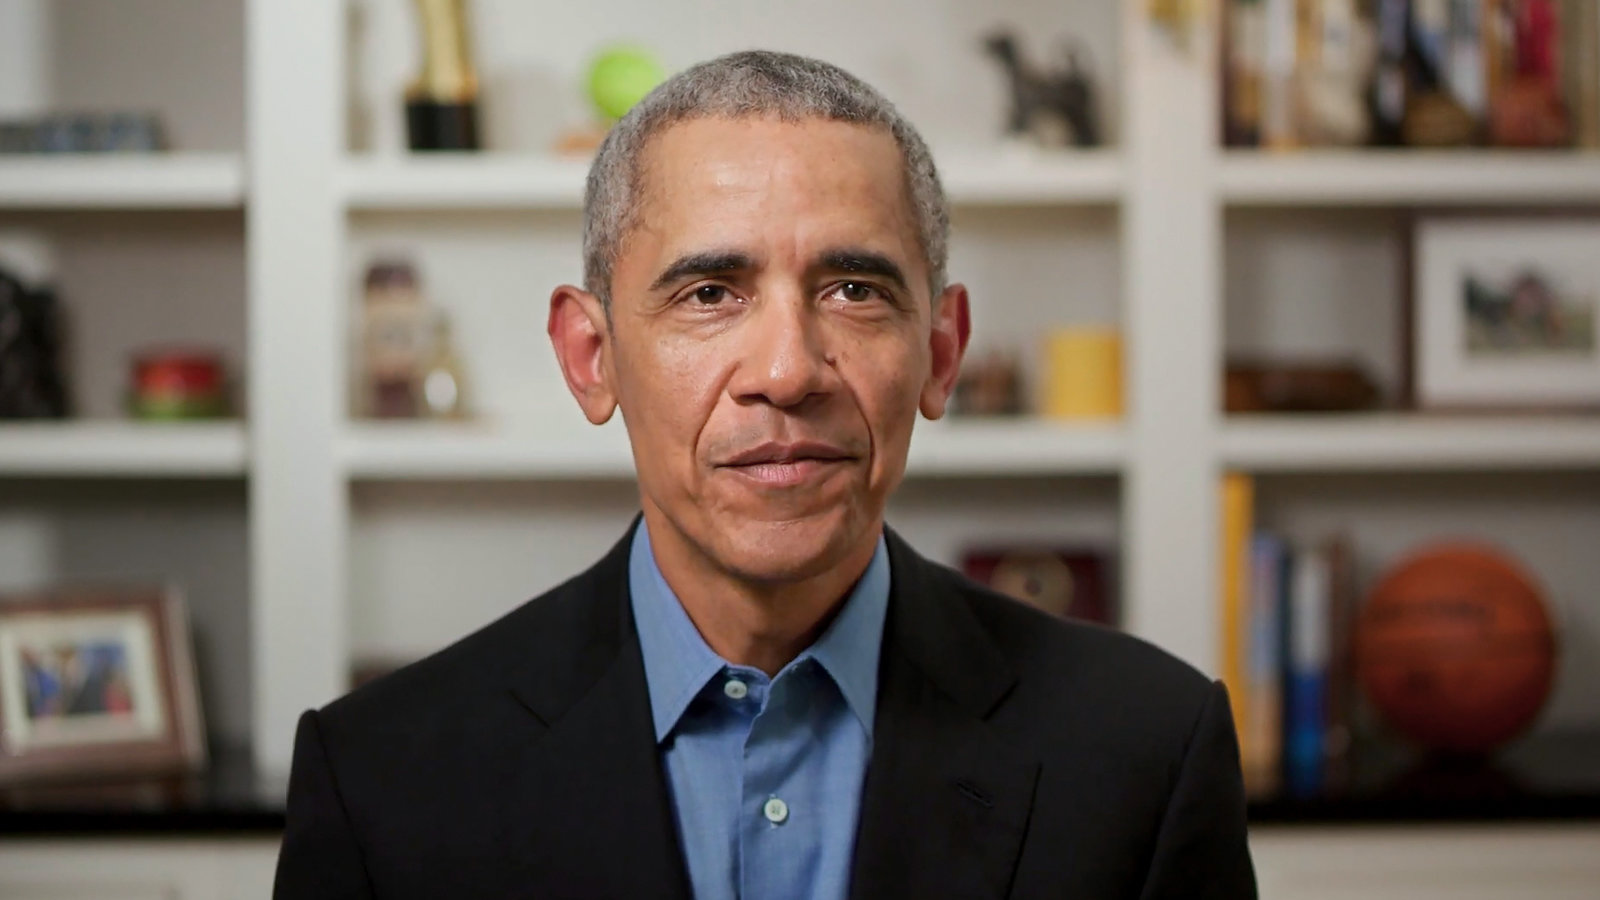 President Obama Speaks!